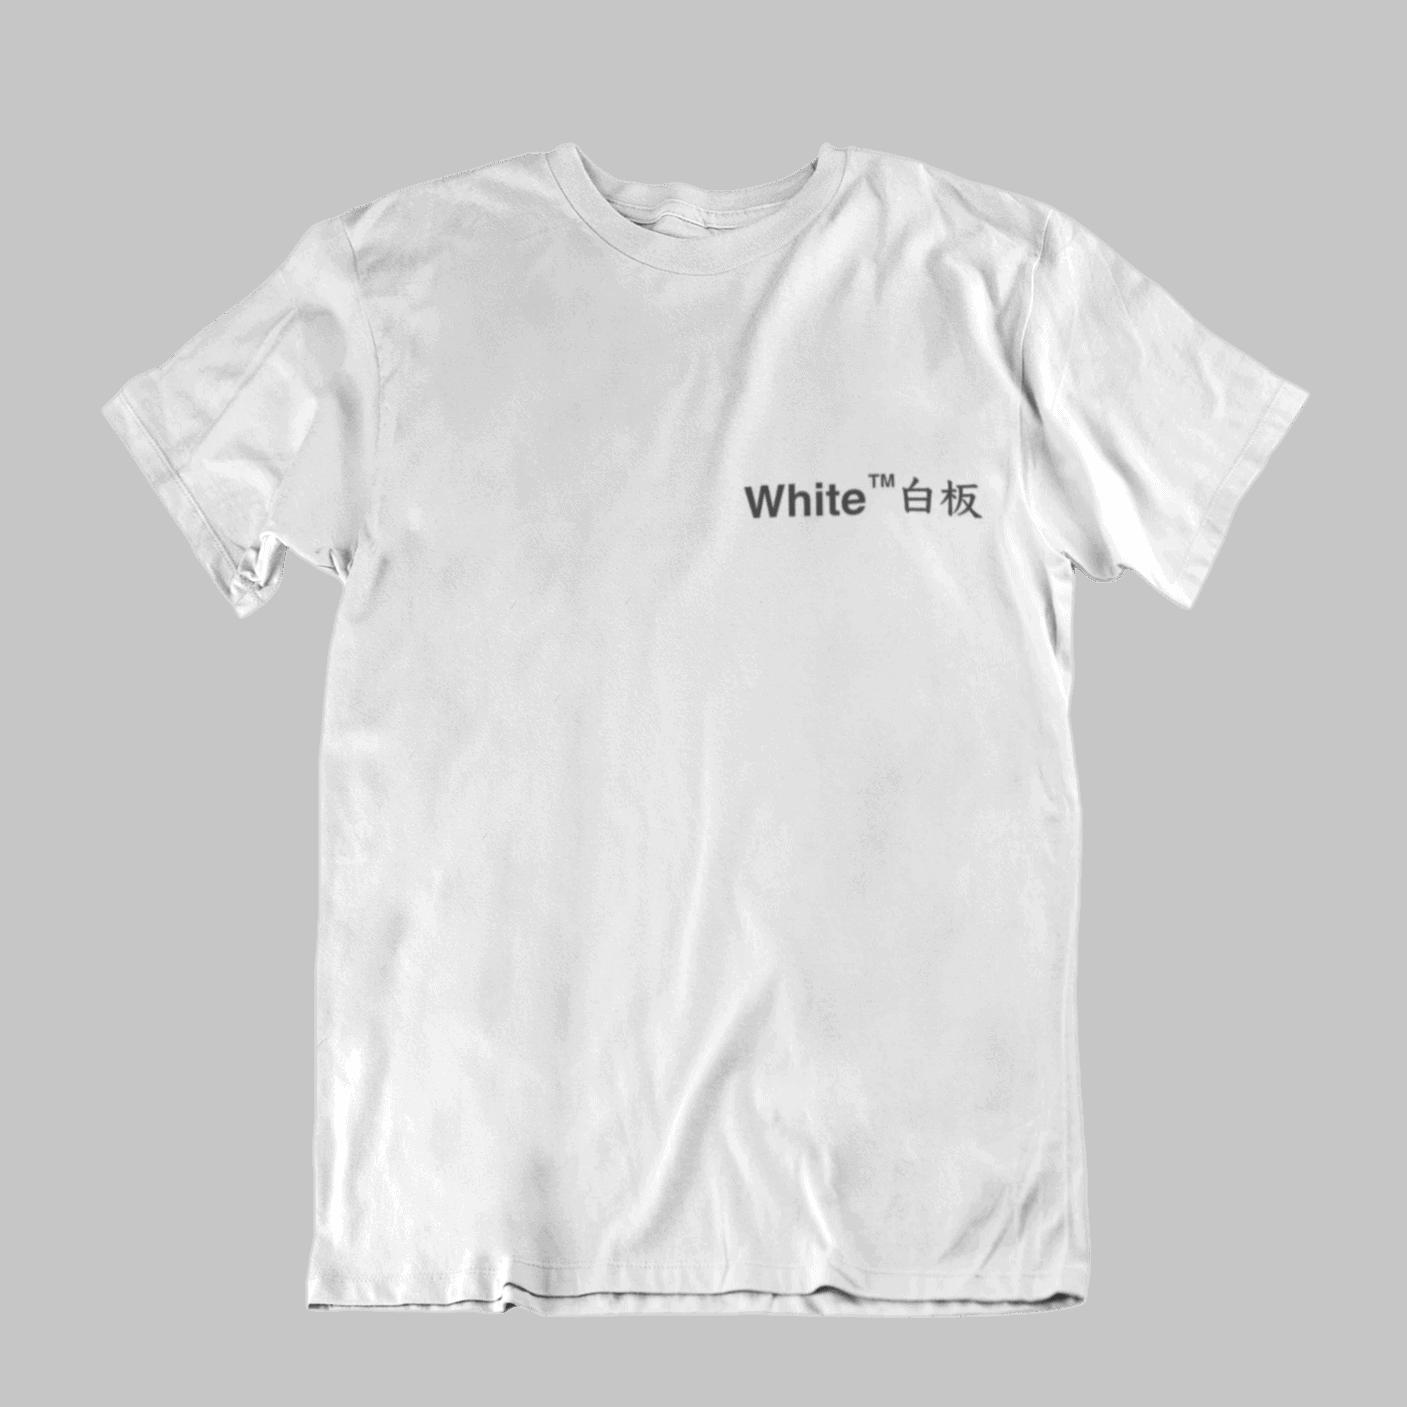 White Board Crew Neck S-Sleeve T-shirt